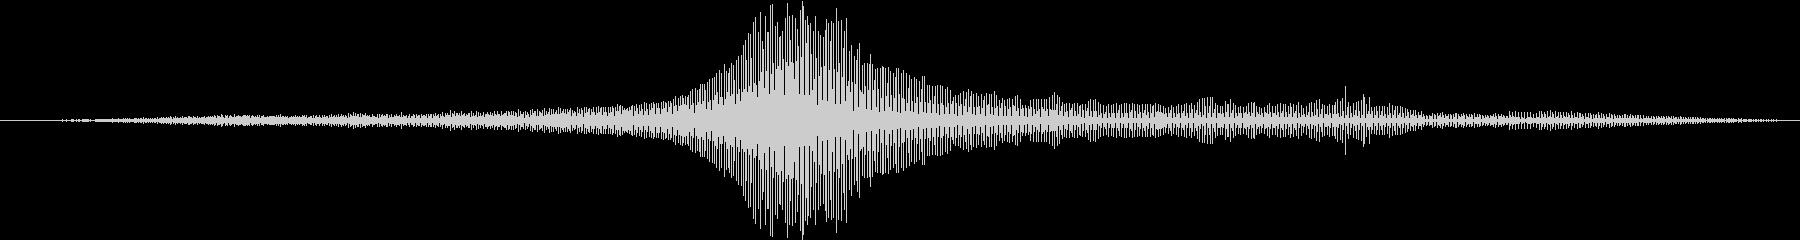 450 Cc 4ストローク:低速、...の未再生の波形